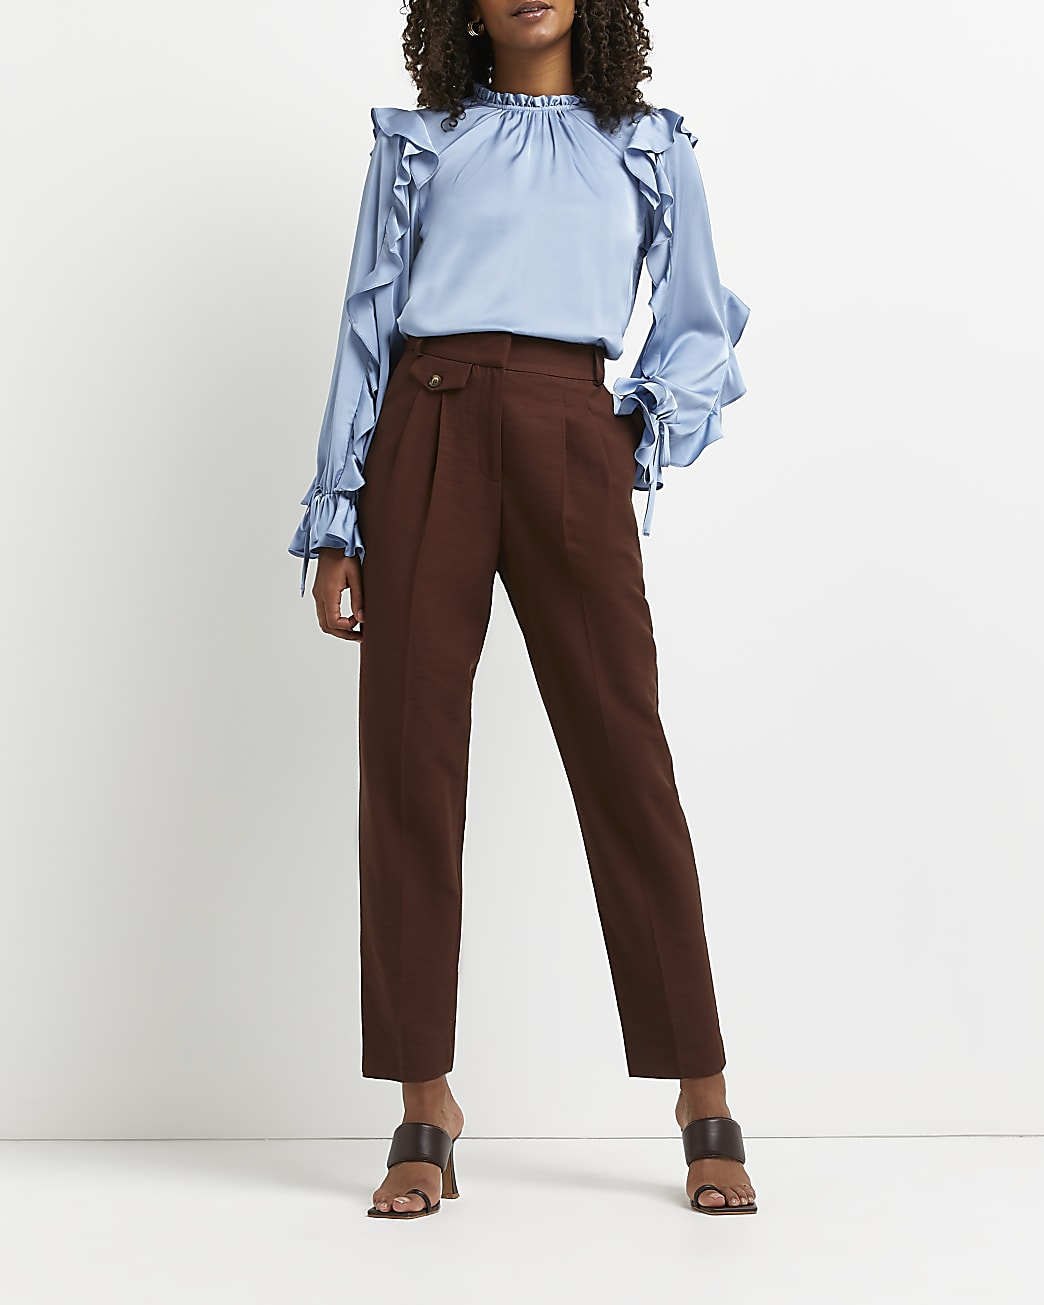 Blue frill detail blouse